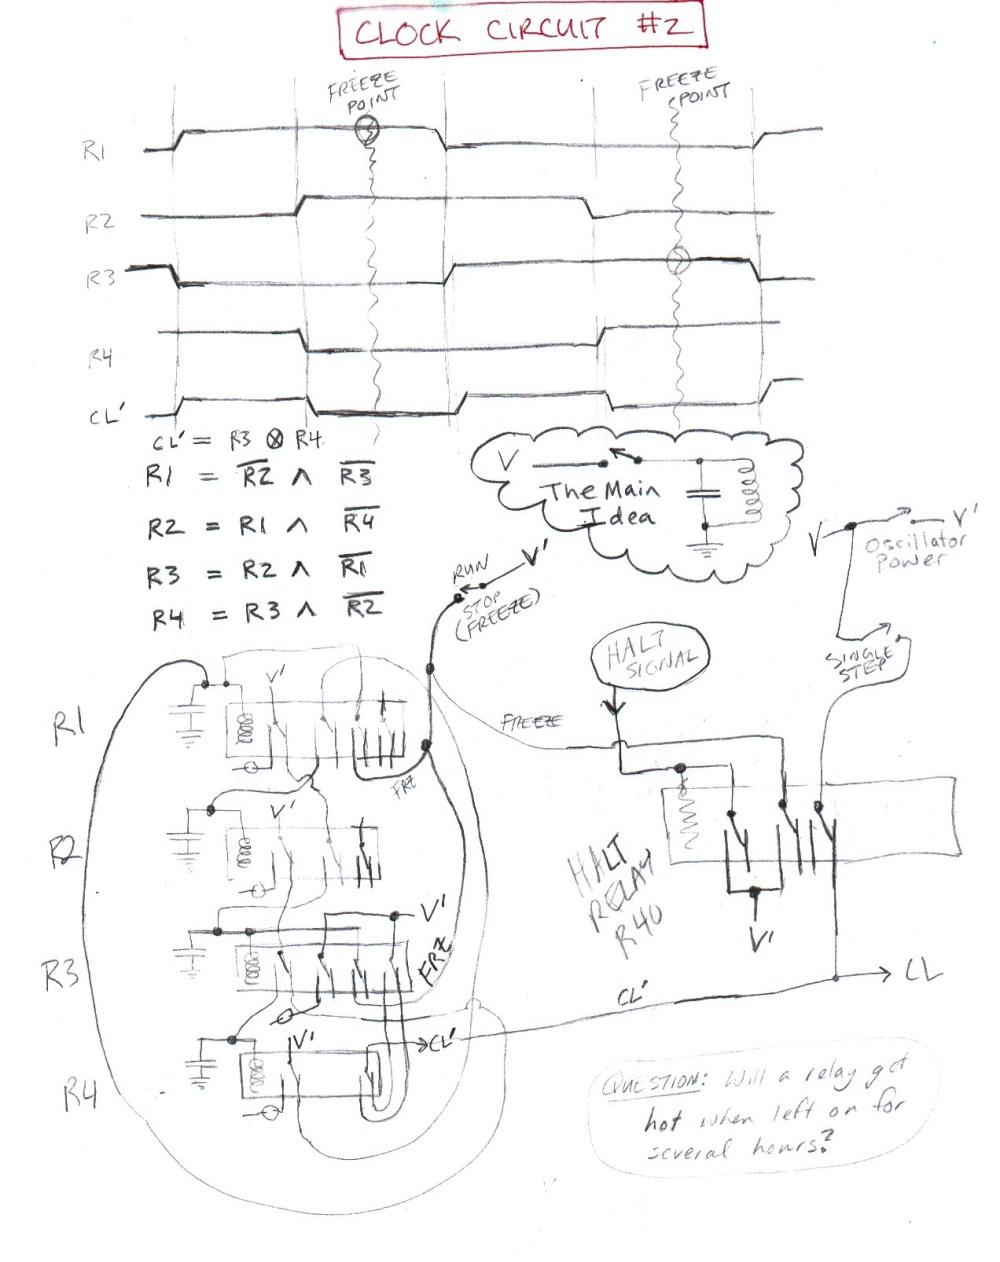 medium resolution of clockcircuit 1